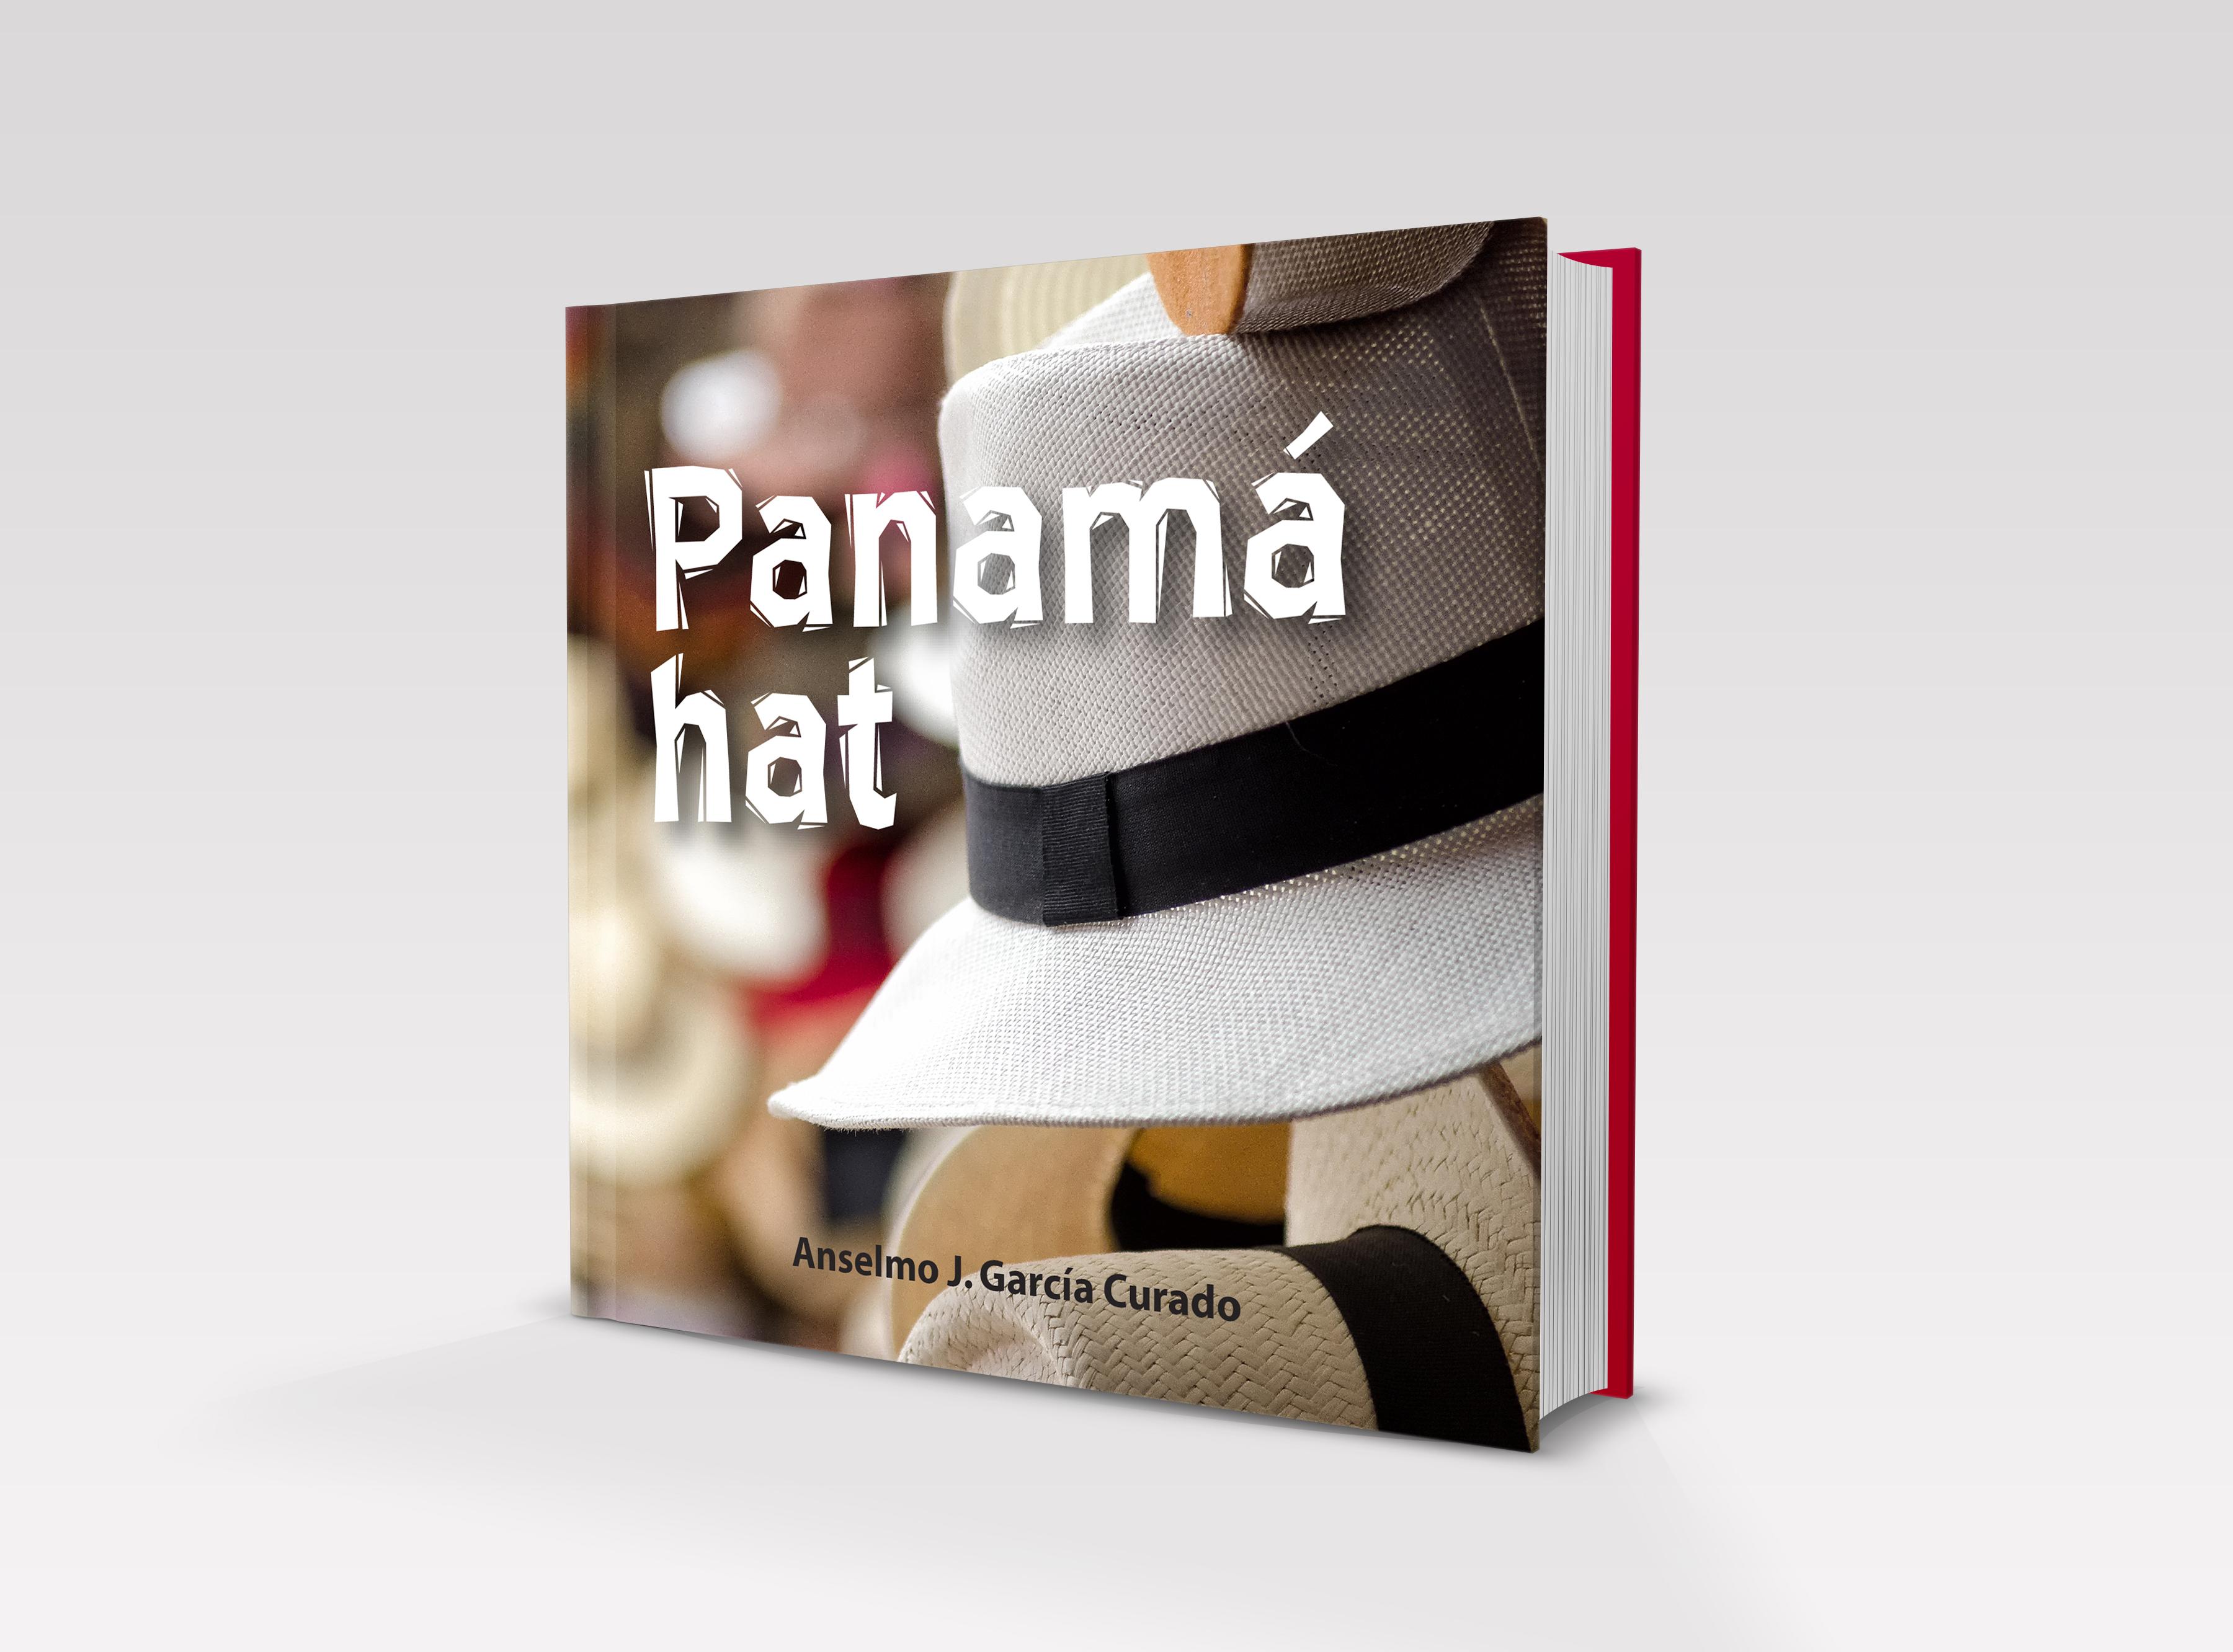 Panama hat b